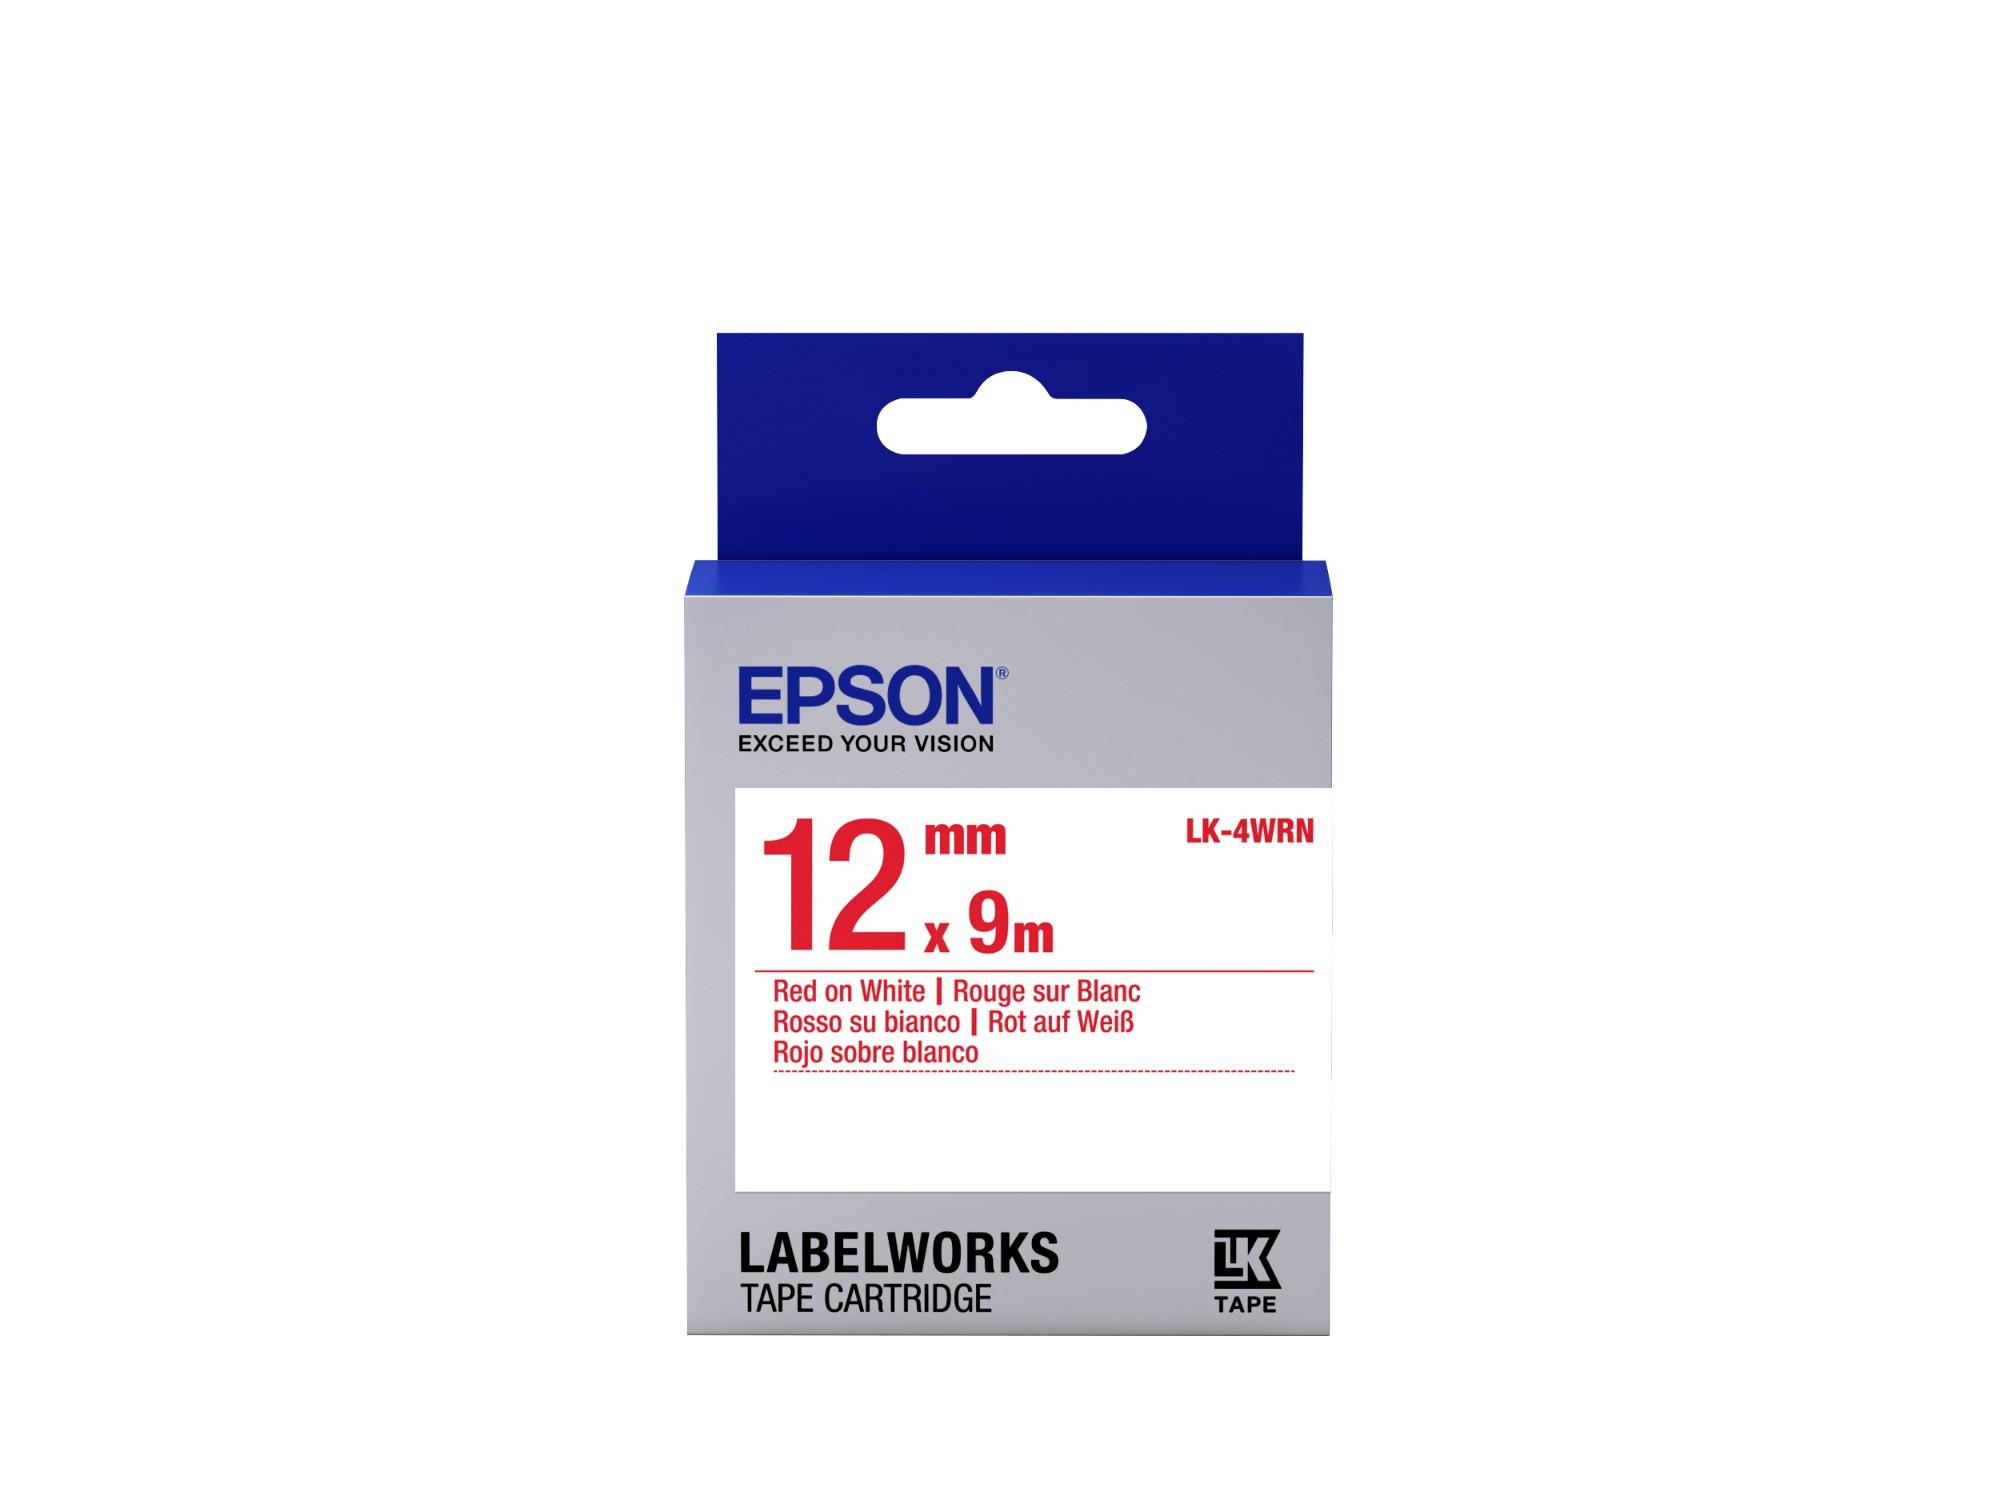 Epson Cinta estándar - LK-4WRN estándar roja/blanca 12/9